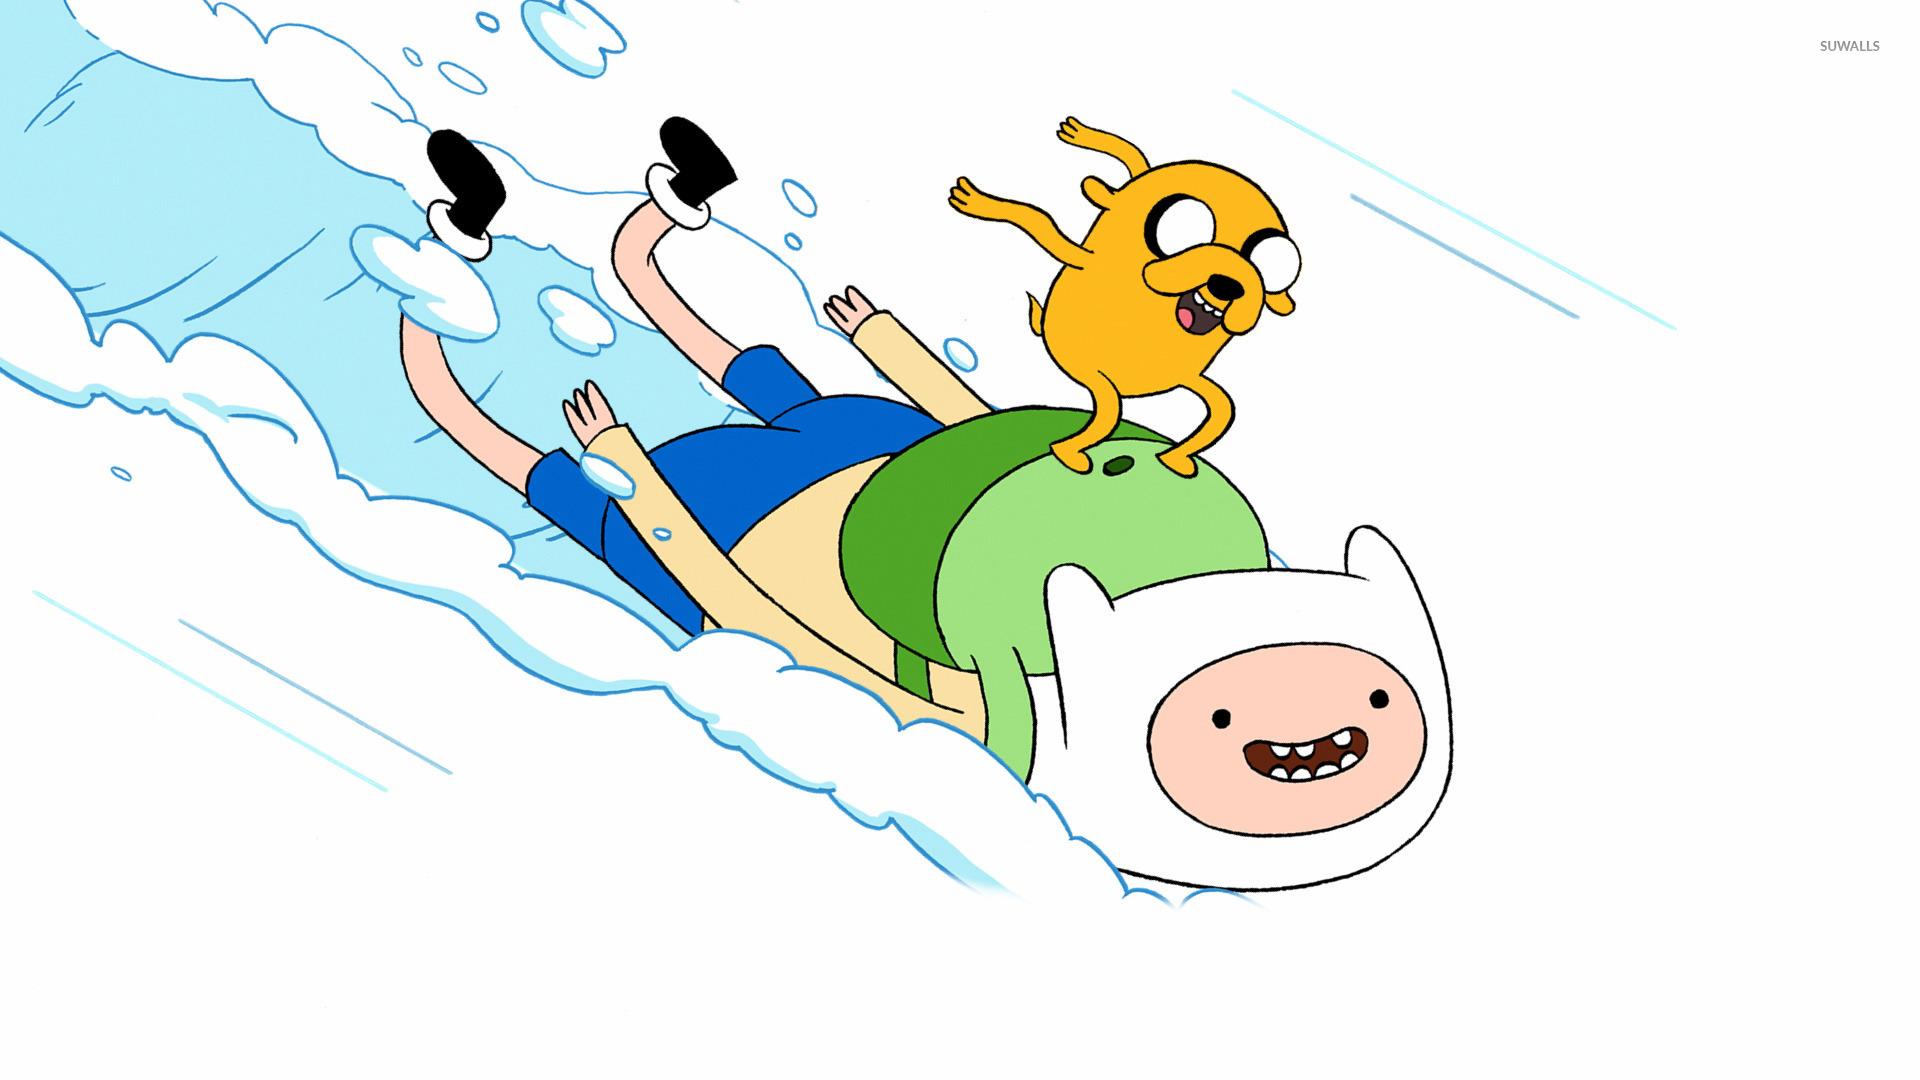 Finn and Jake   Adventure Time wallpaper   Cartoon wallpapers   15795 1920x1080